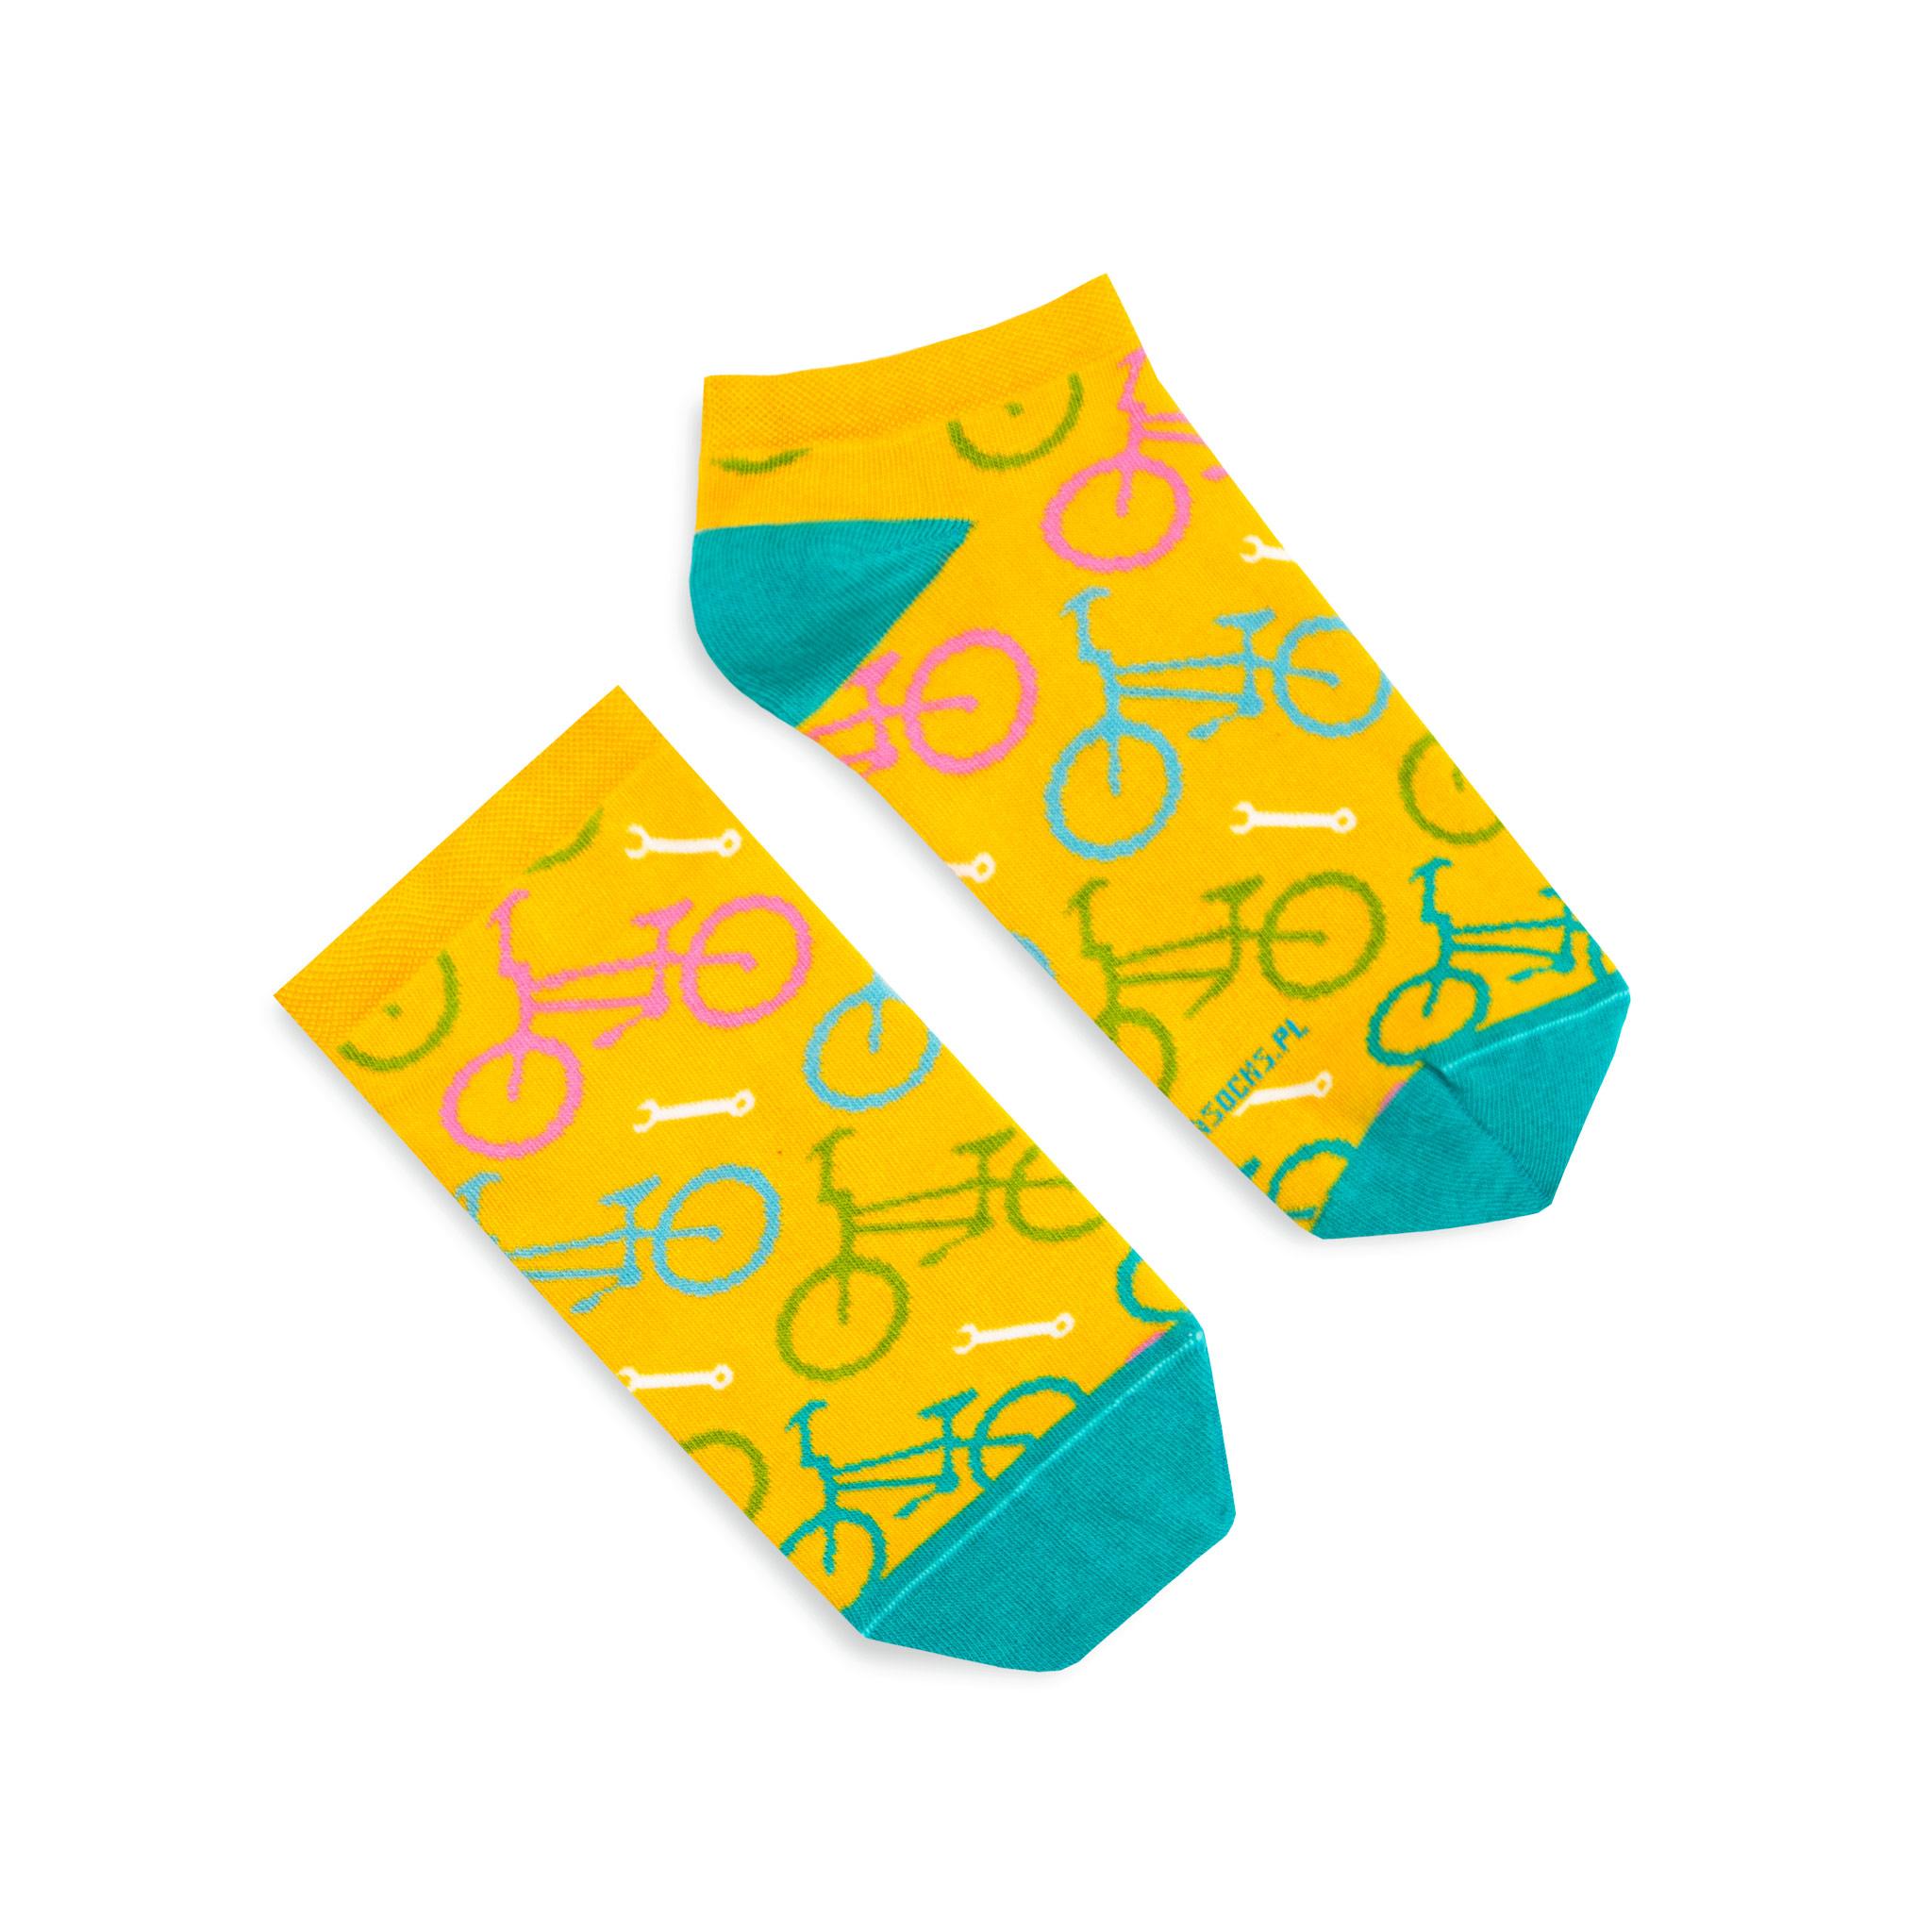 Banana Socks Unisex's Socks Short Bicycles